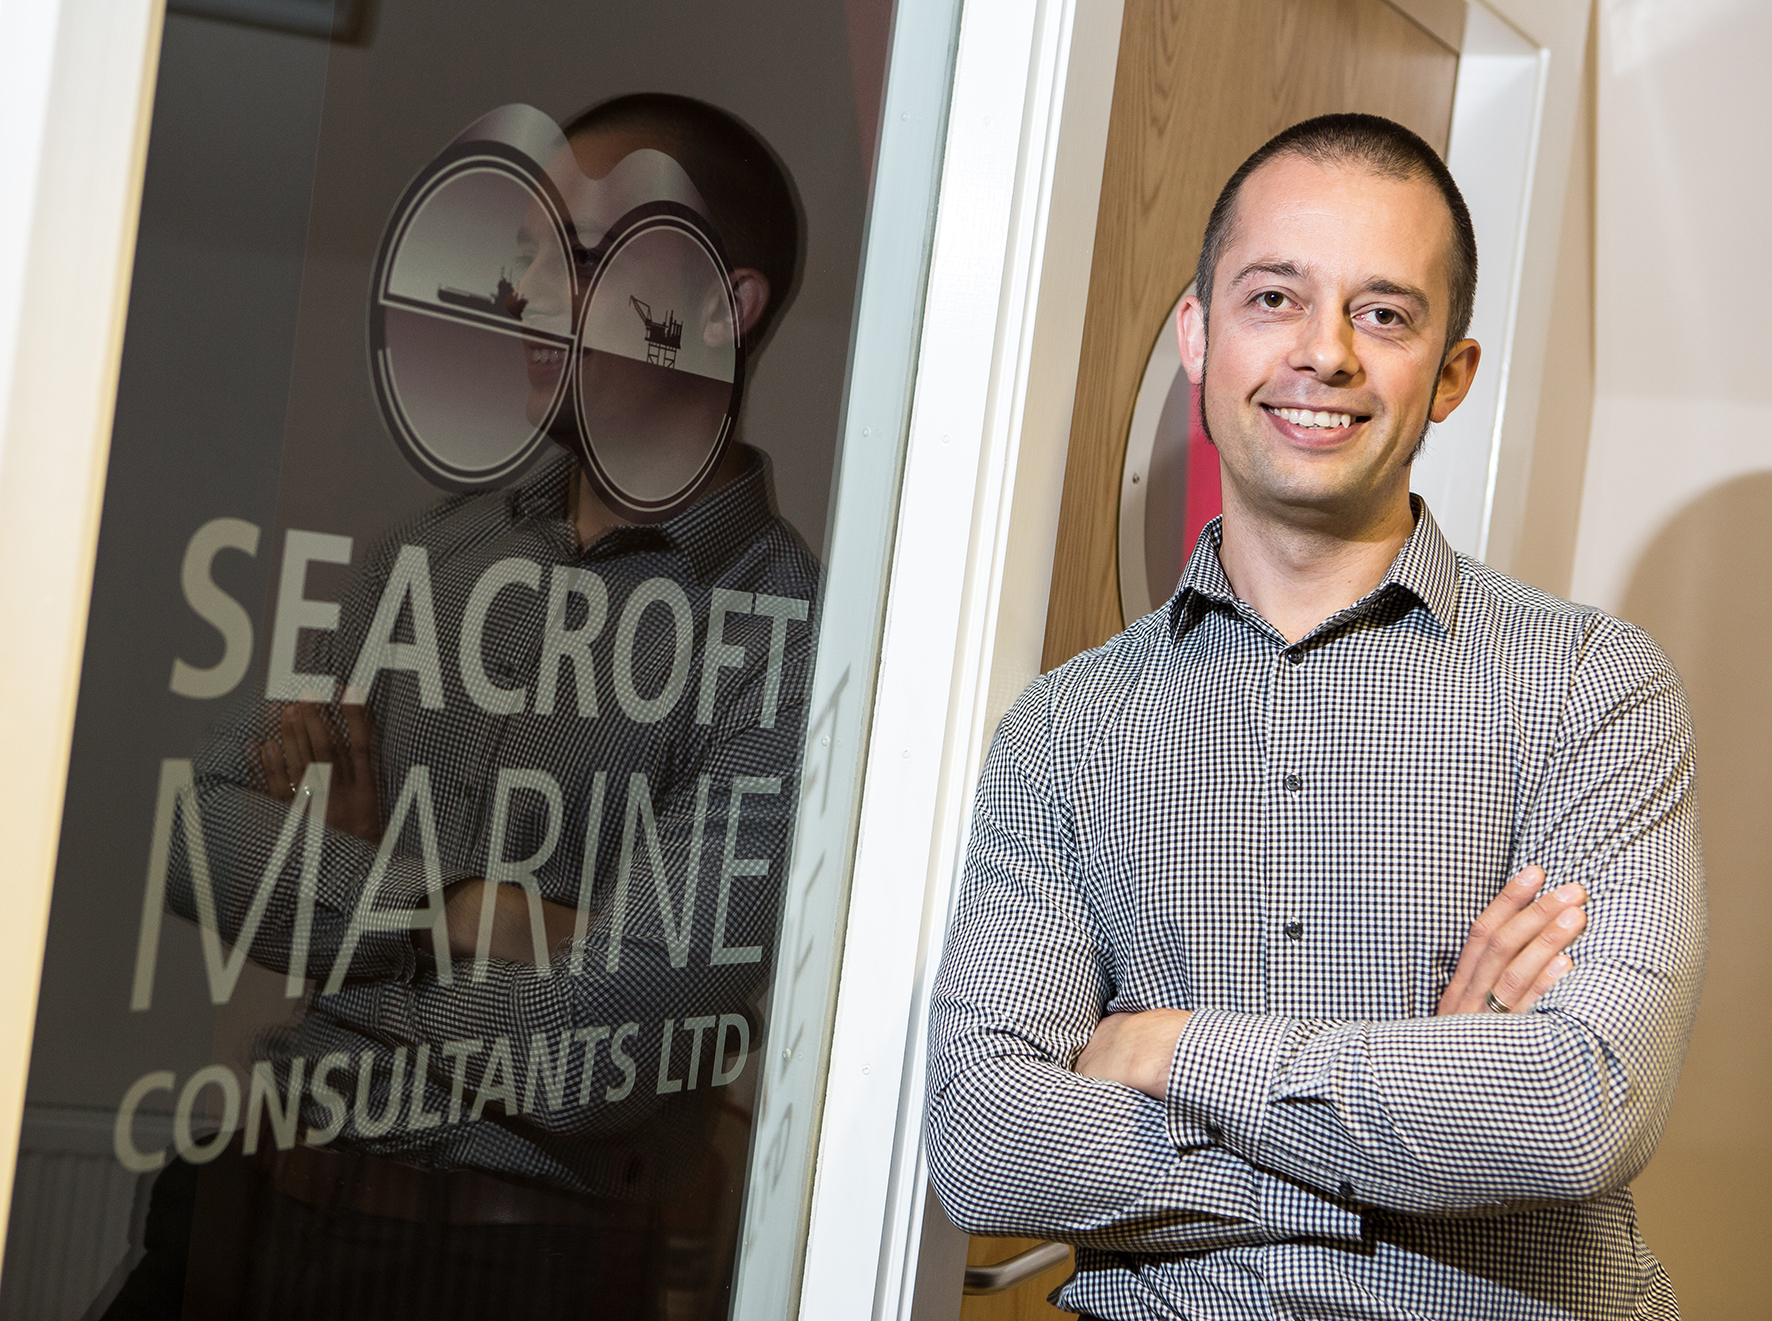 Seacroft Marine has won a new contract